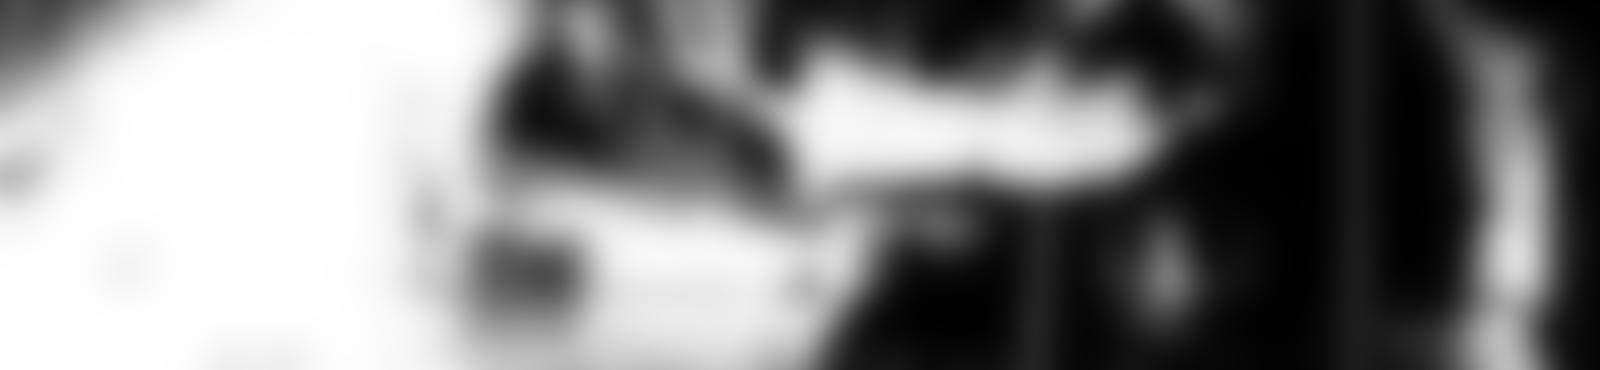 Blurred bar tausend